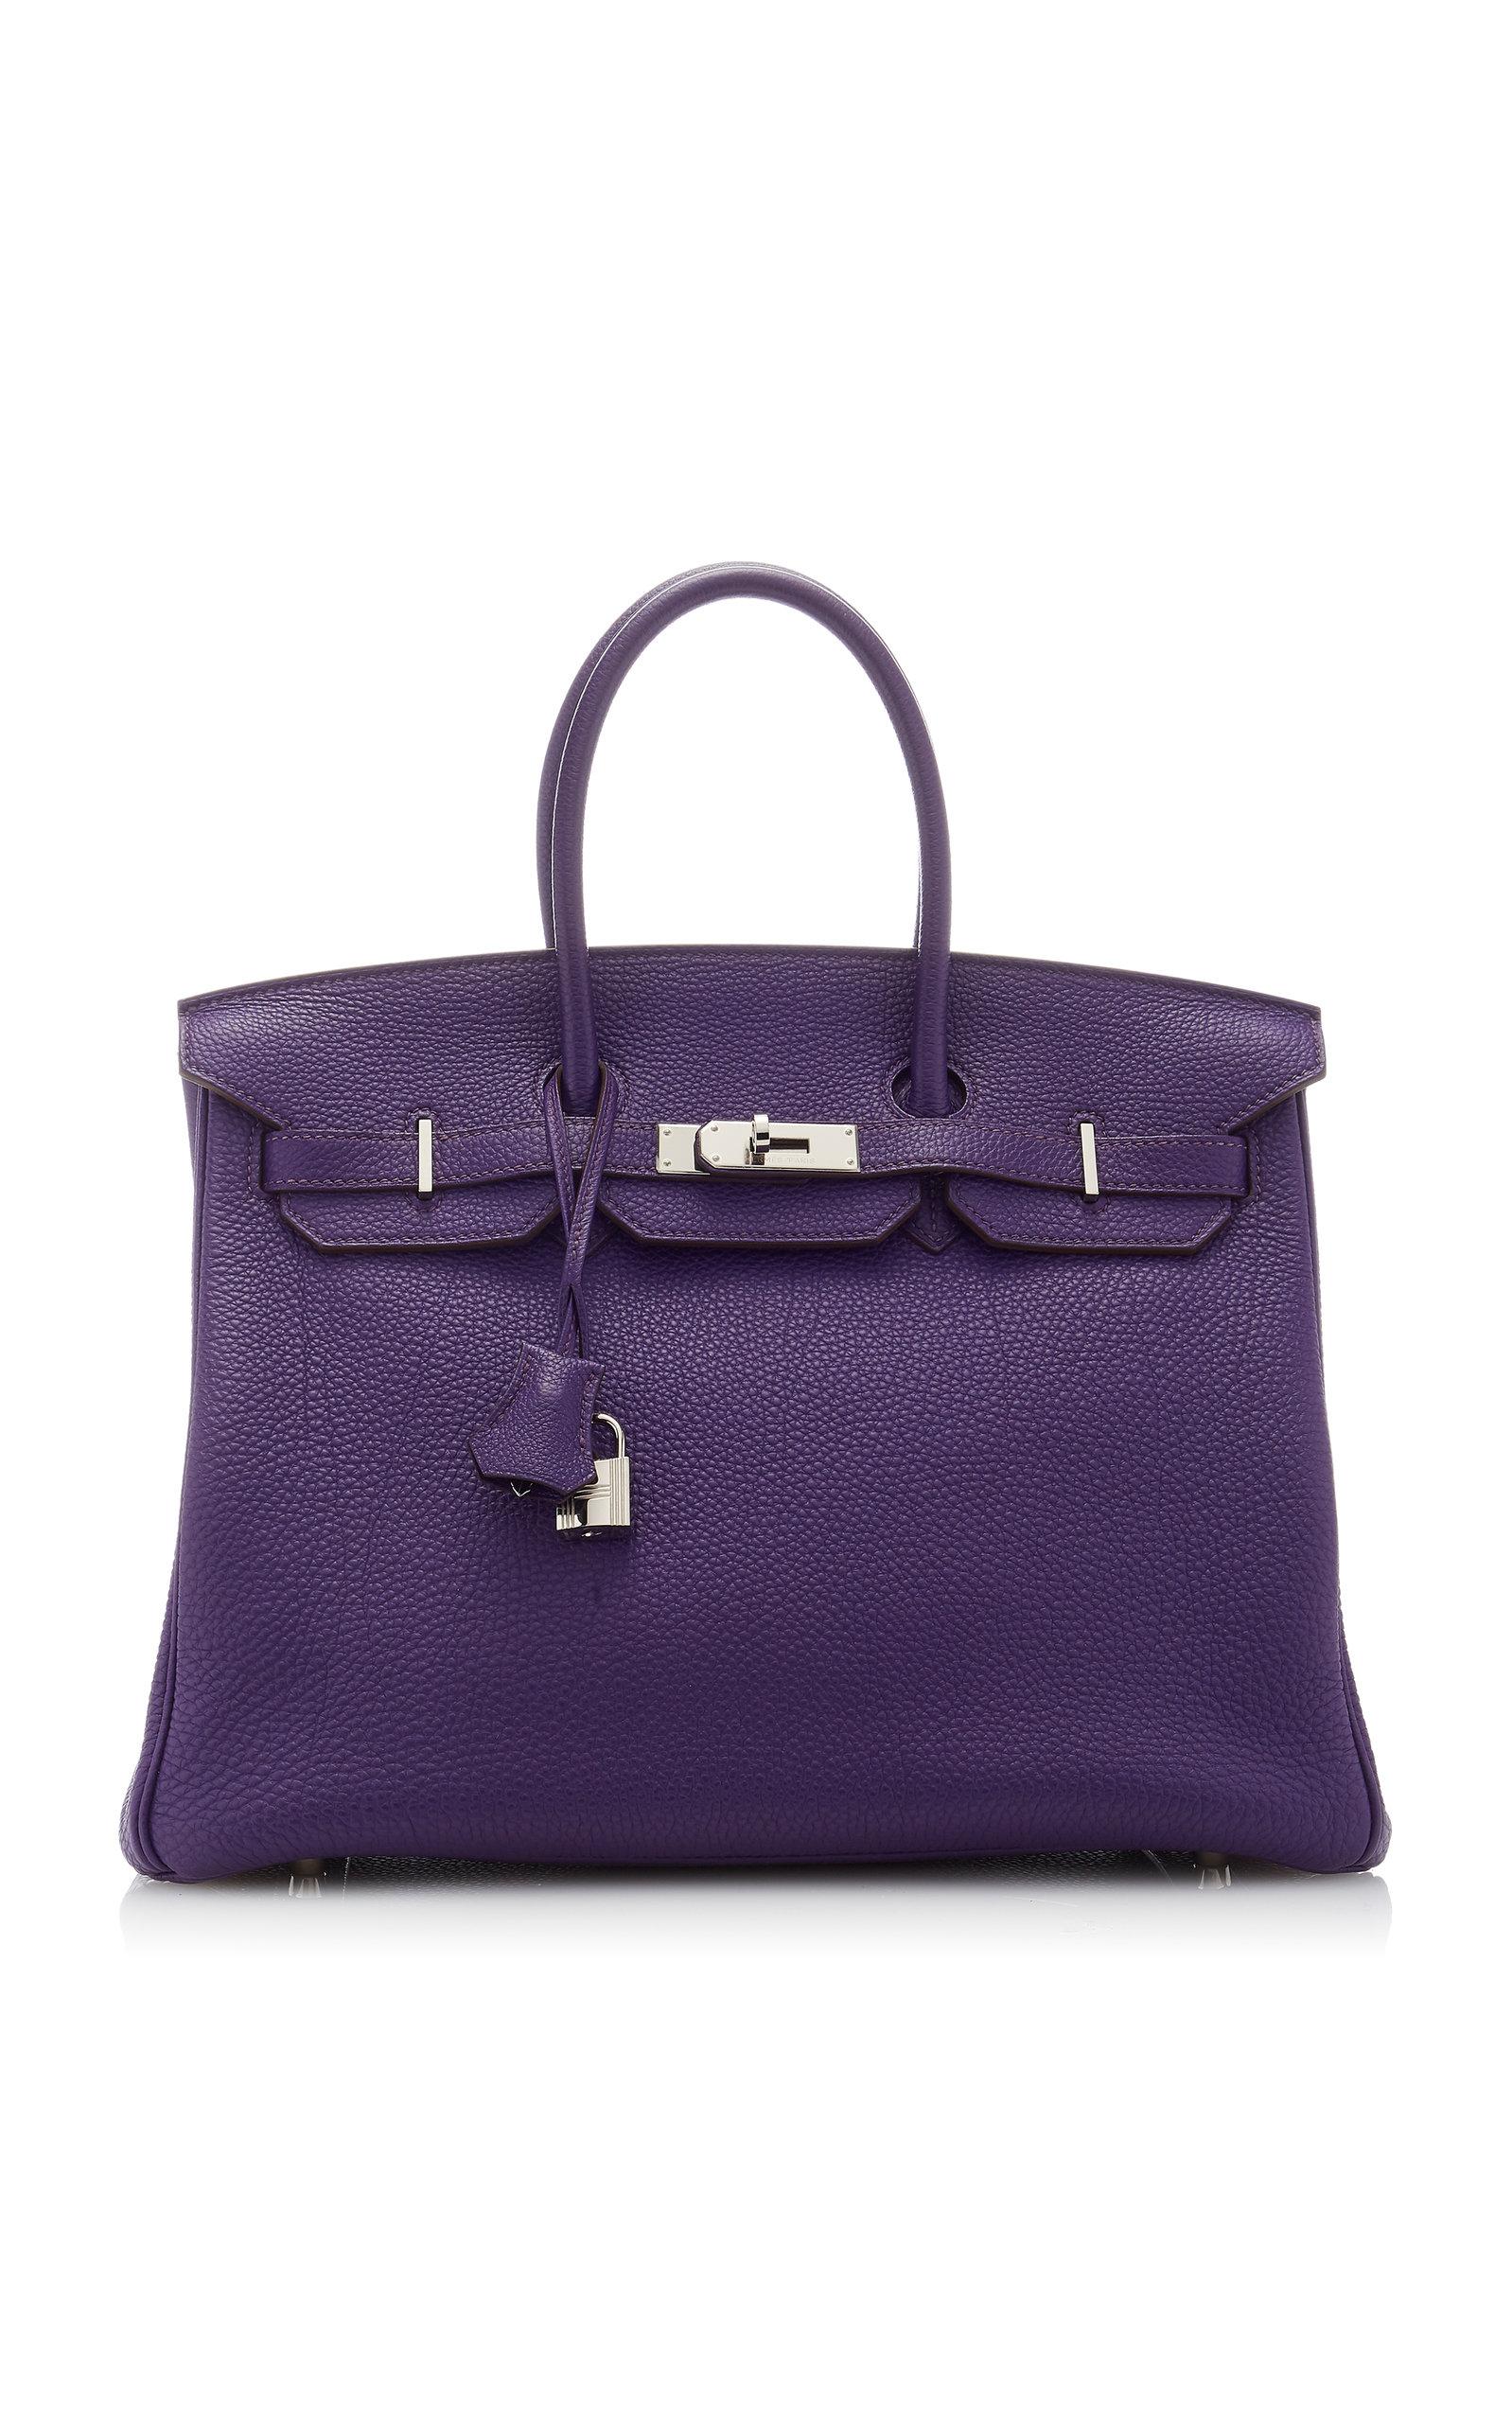 HermÈS Vintage By Heritage Auctions HermÈS 35Cm Iris Togo Leather Birkin Bag In Purple